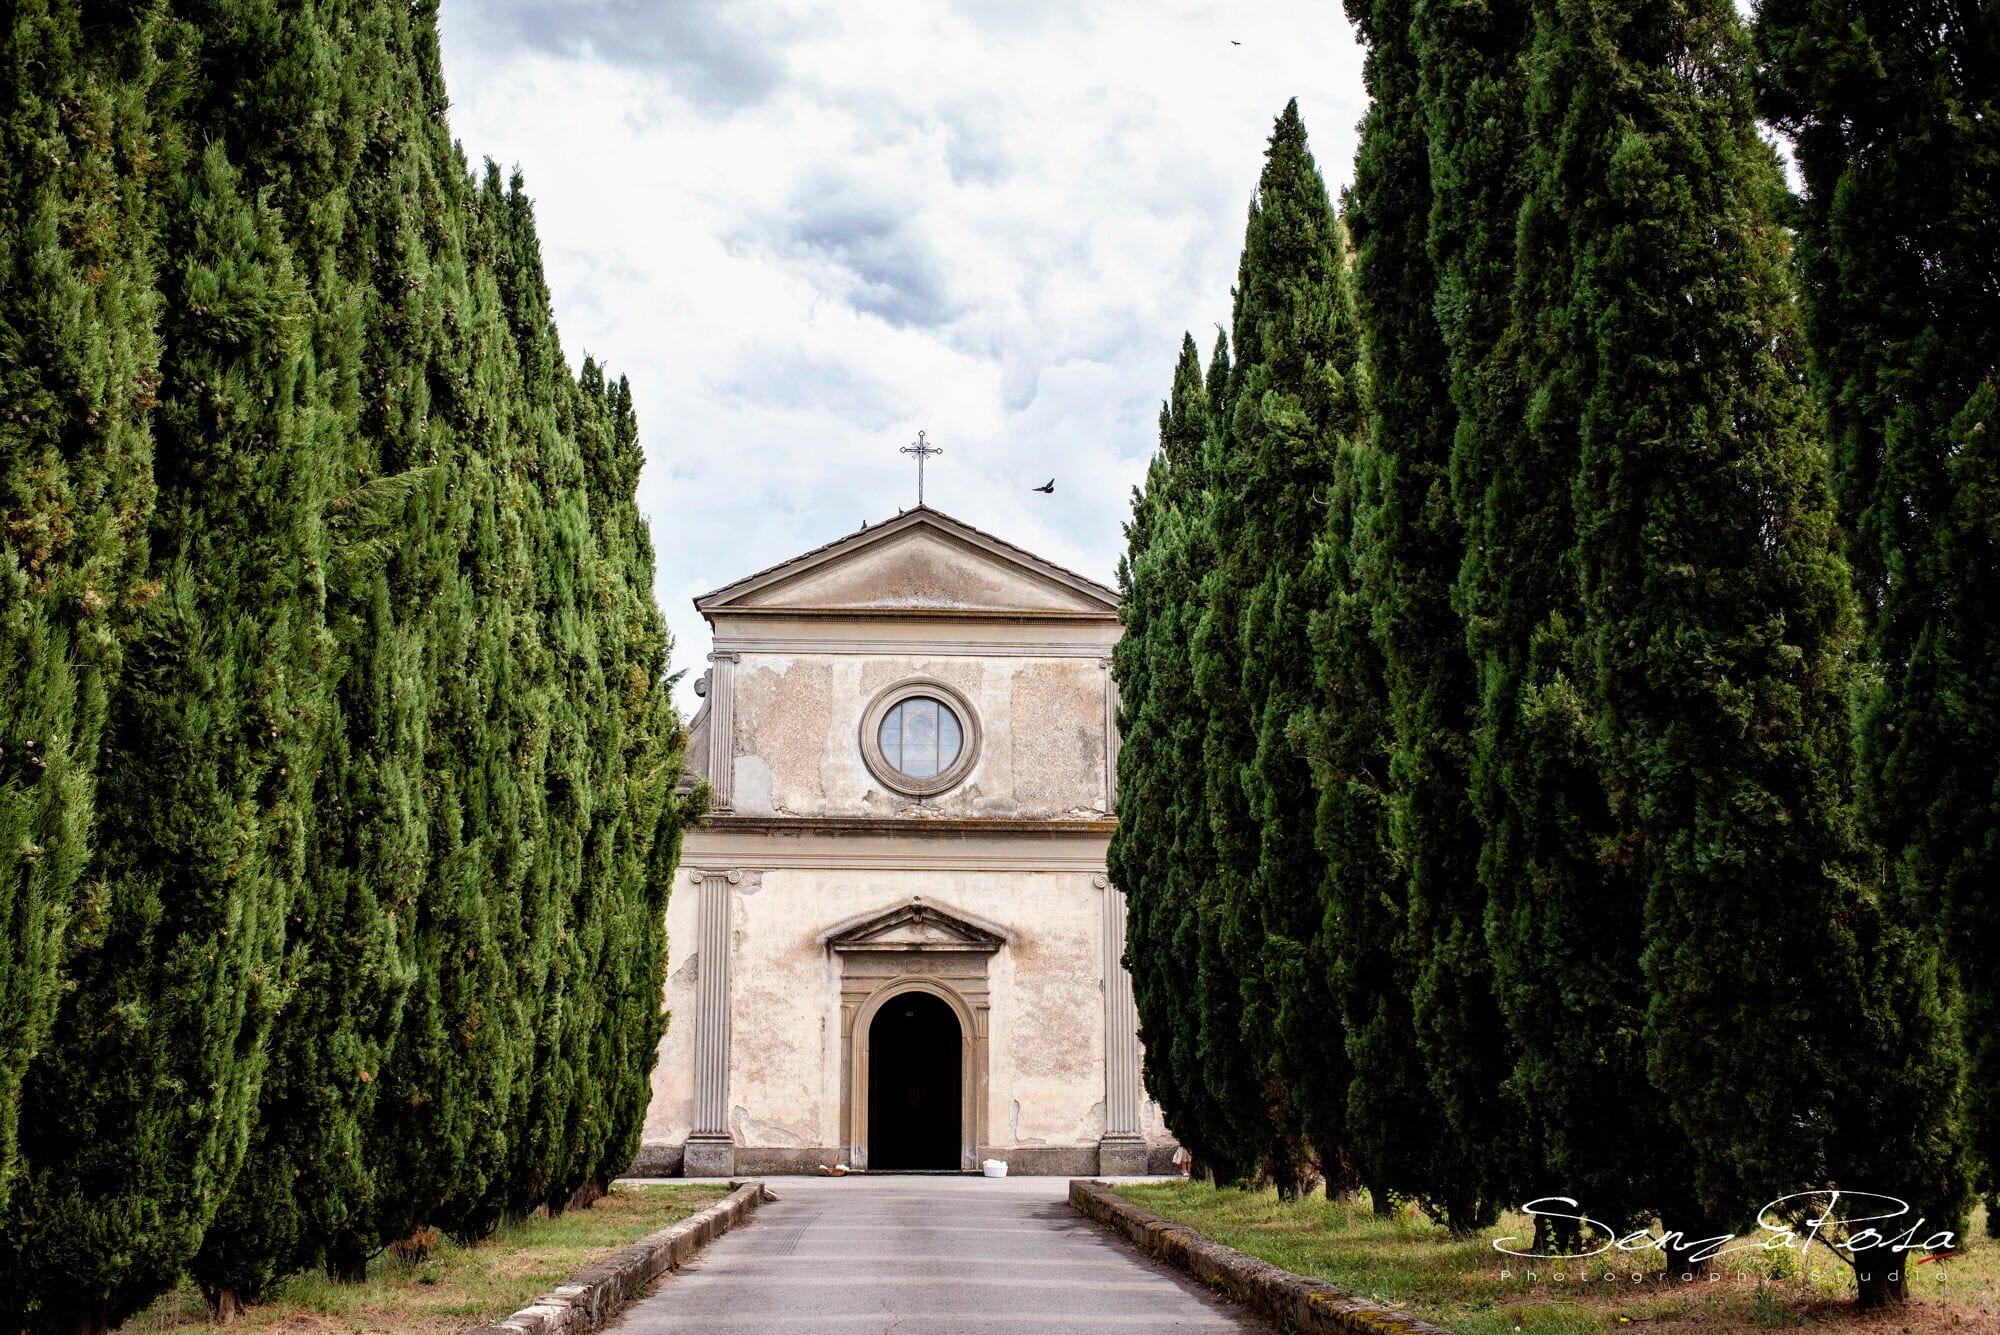 Matrimonio Campagna Toscana : Matrimonio nel mugello fotografo firenze